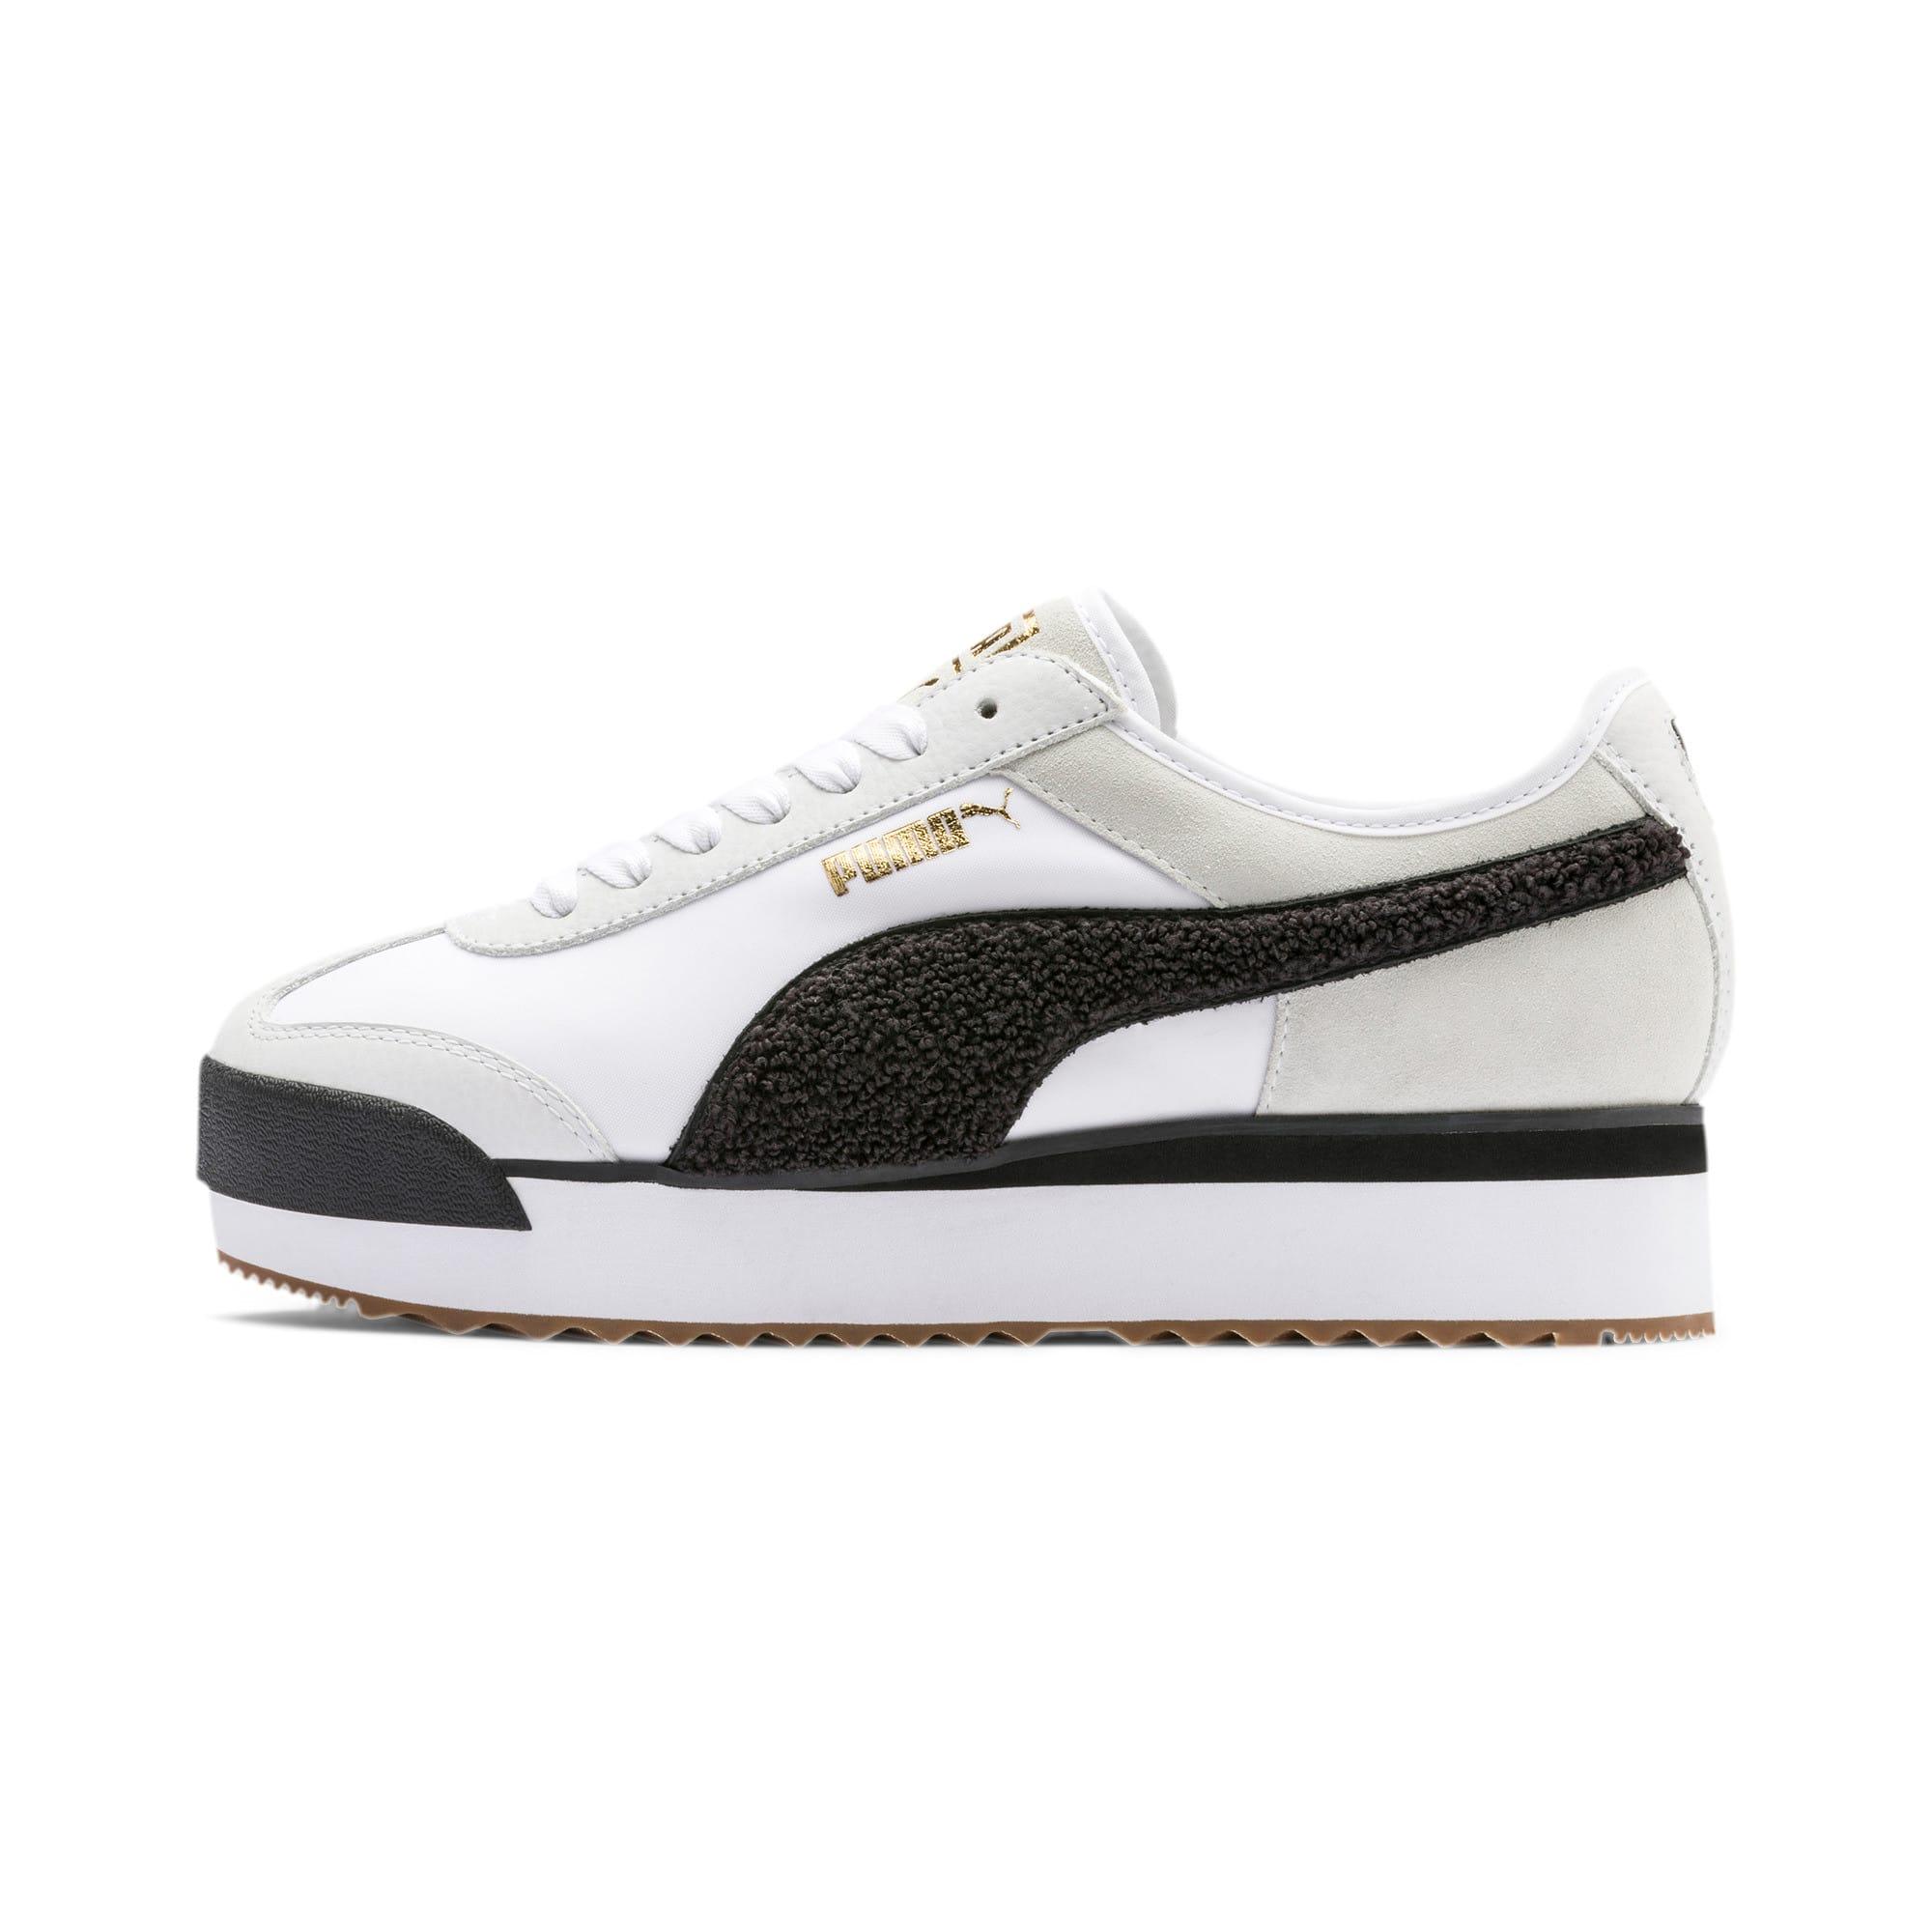 Thumbnail 1 of Roma Amor Heritage Women's Sneakers, Puma White-Puma Black, medium